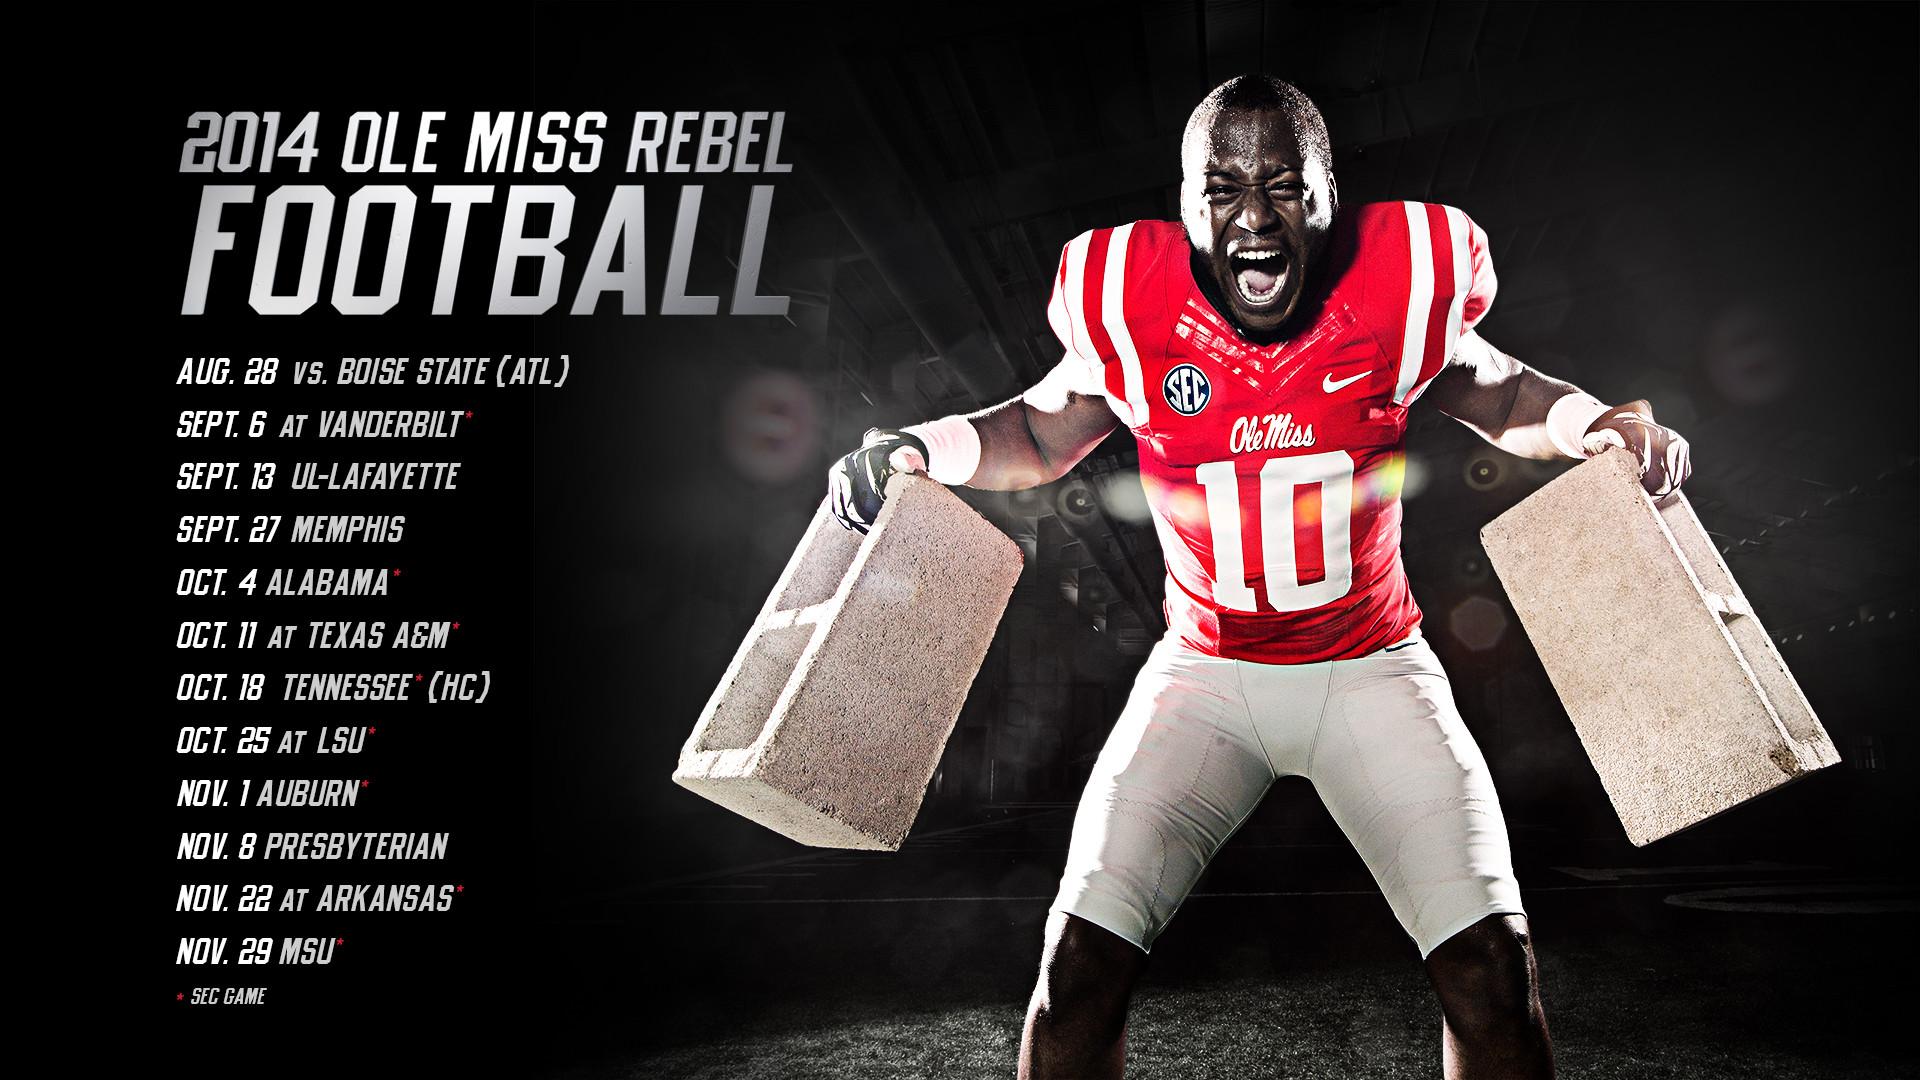 Ole Miss Football Wallpaper